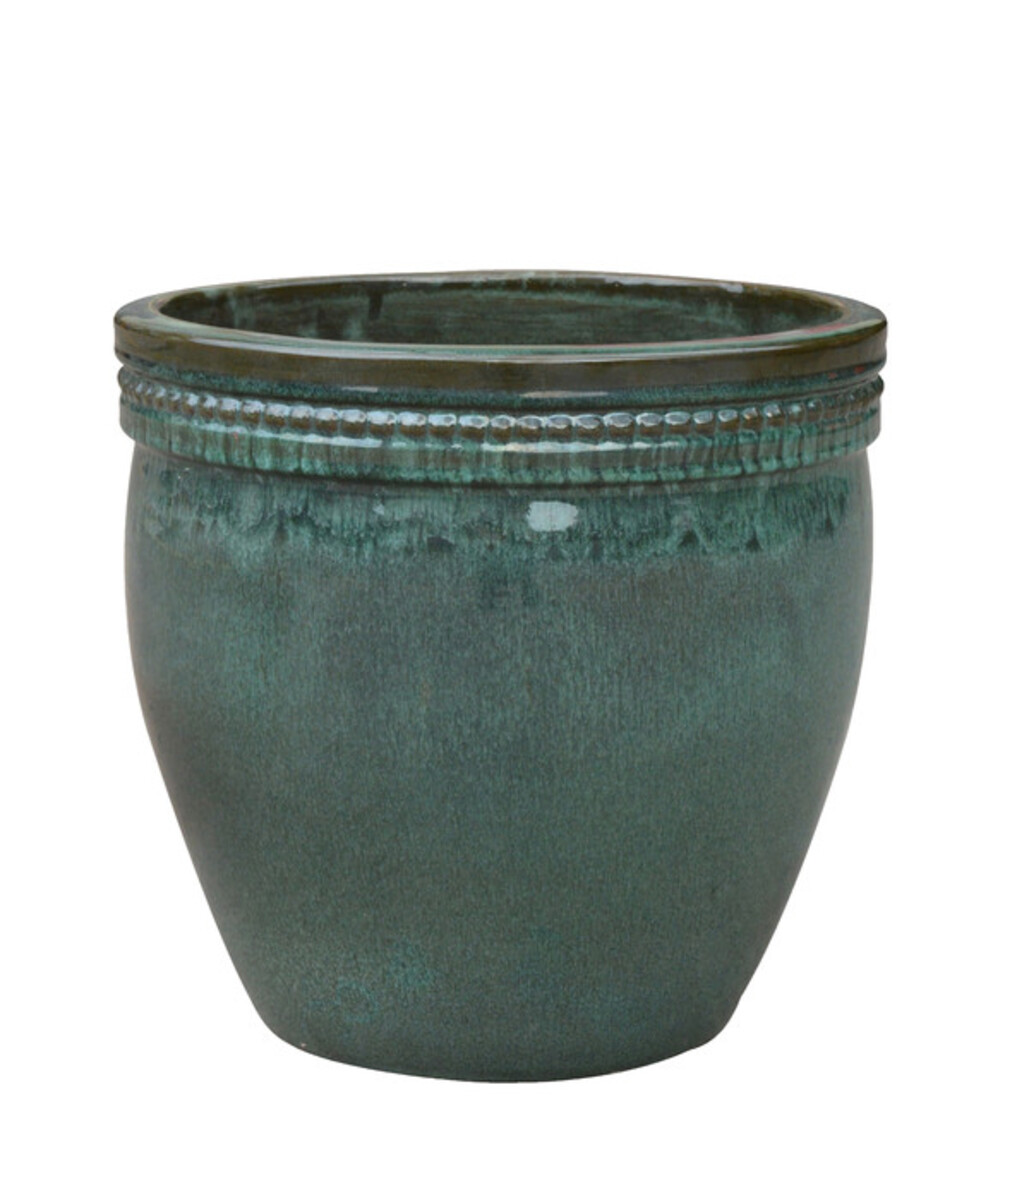 Bild 1 von Dehner Keramik-Topf